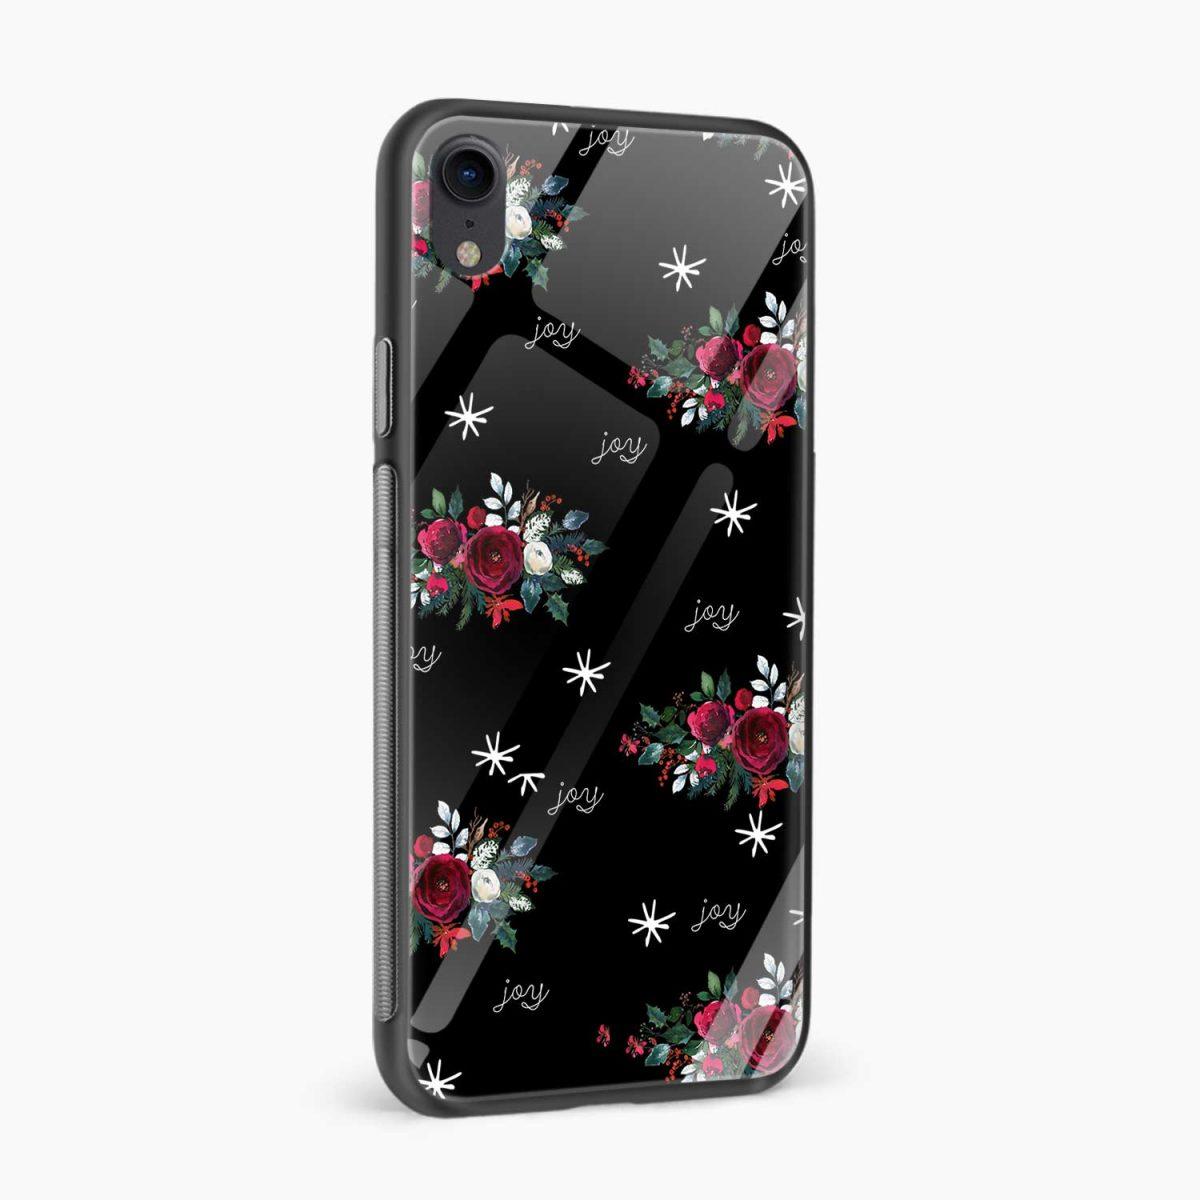 joy floral black coloured apple iphone xr back cover side view